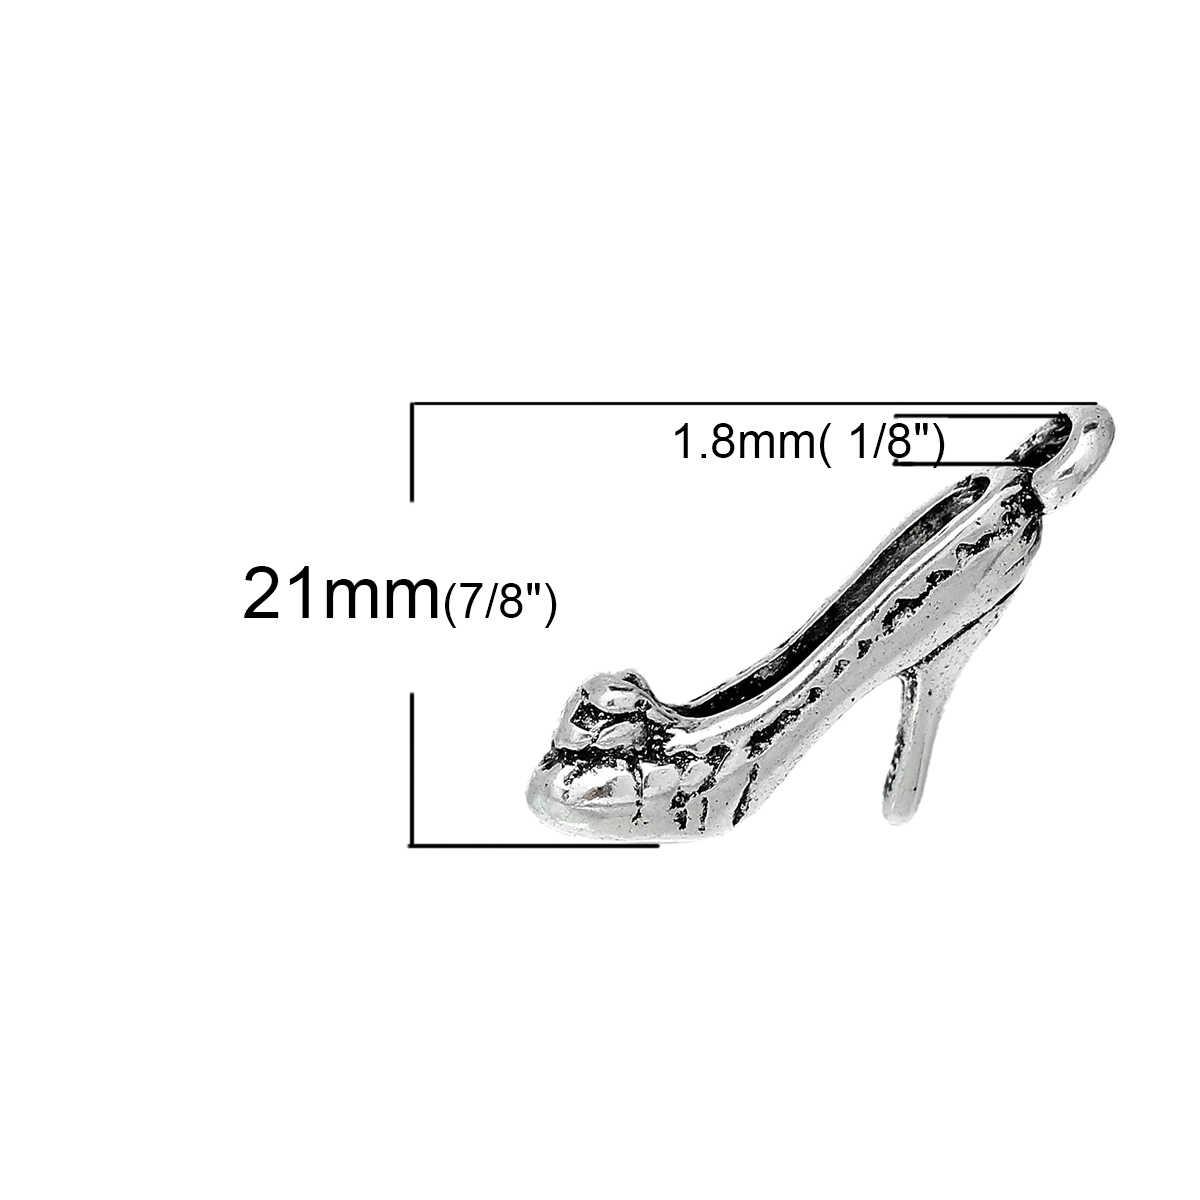 "DoreenBeads Zinc colgante de adorno de aleación metálica colgantes zapatos de tacón alto plata antigua 21mm (7/8 "") x 4mm (1/8""), 4 Uds"